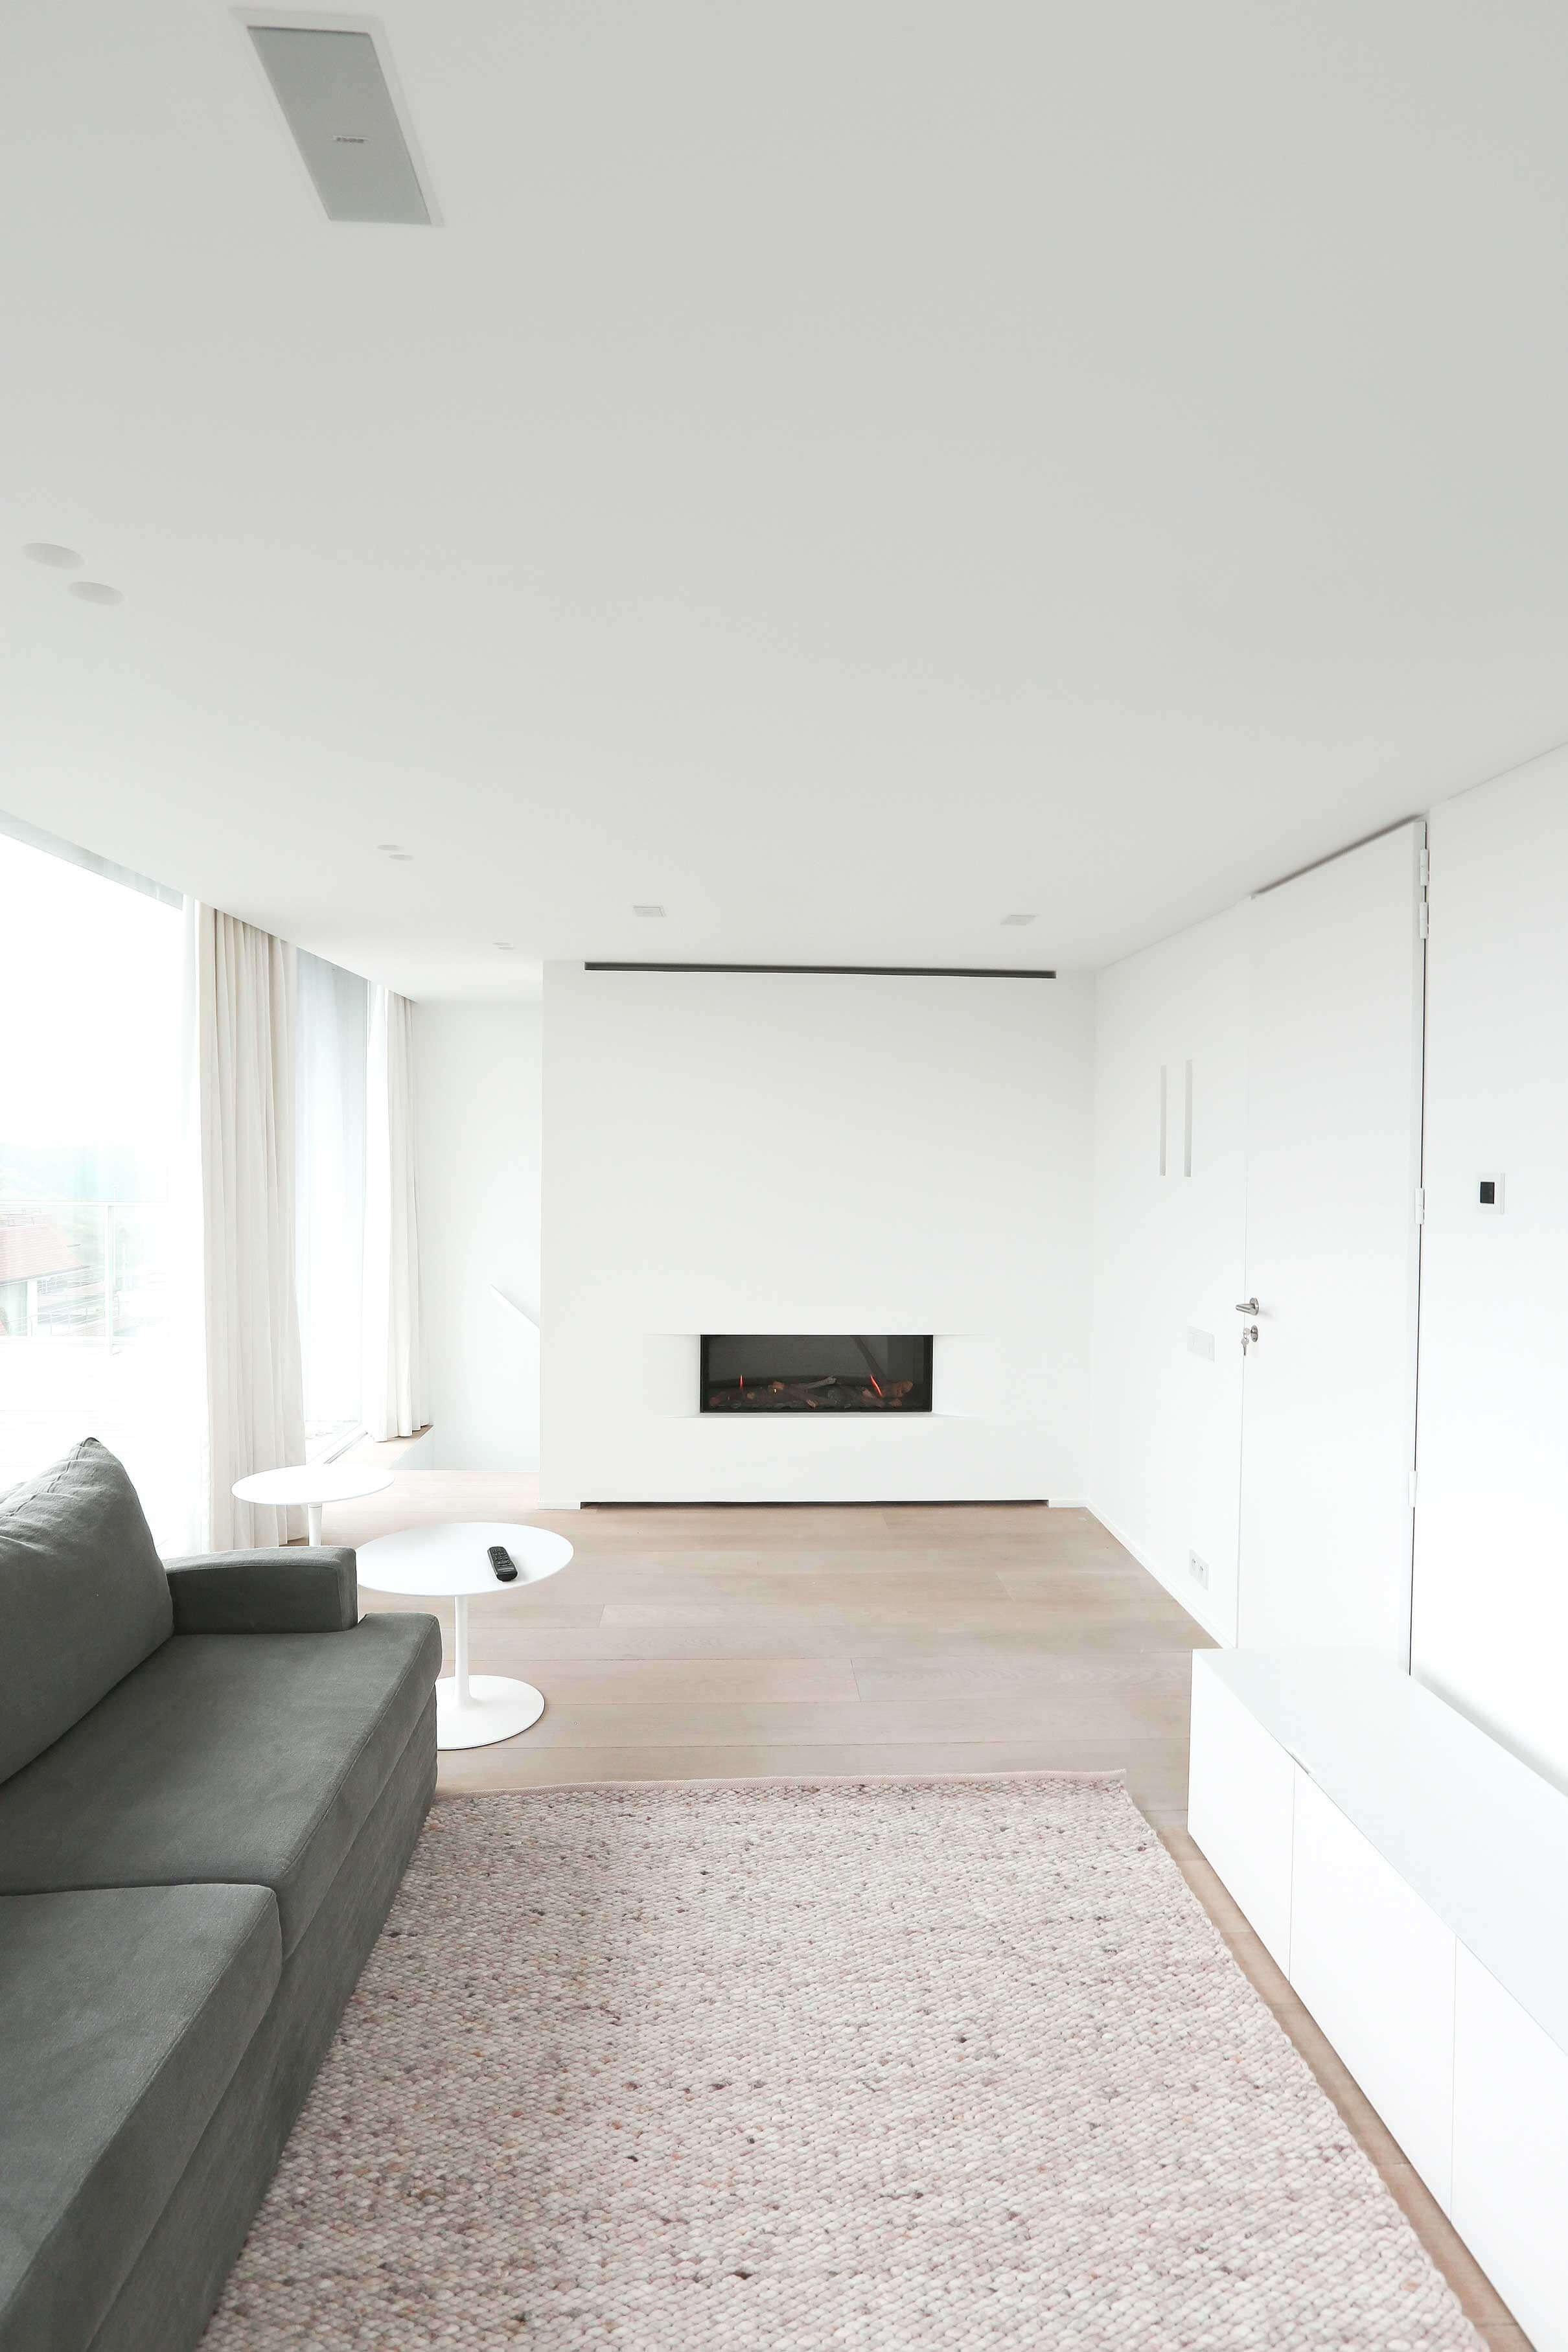 Rietveldprojects.be-ArneJ-duinen-design-architectuur-kust21.jpg